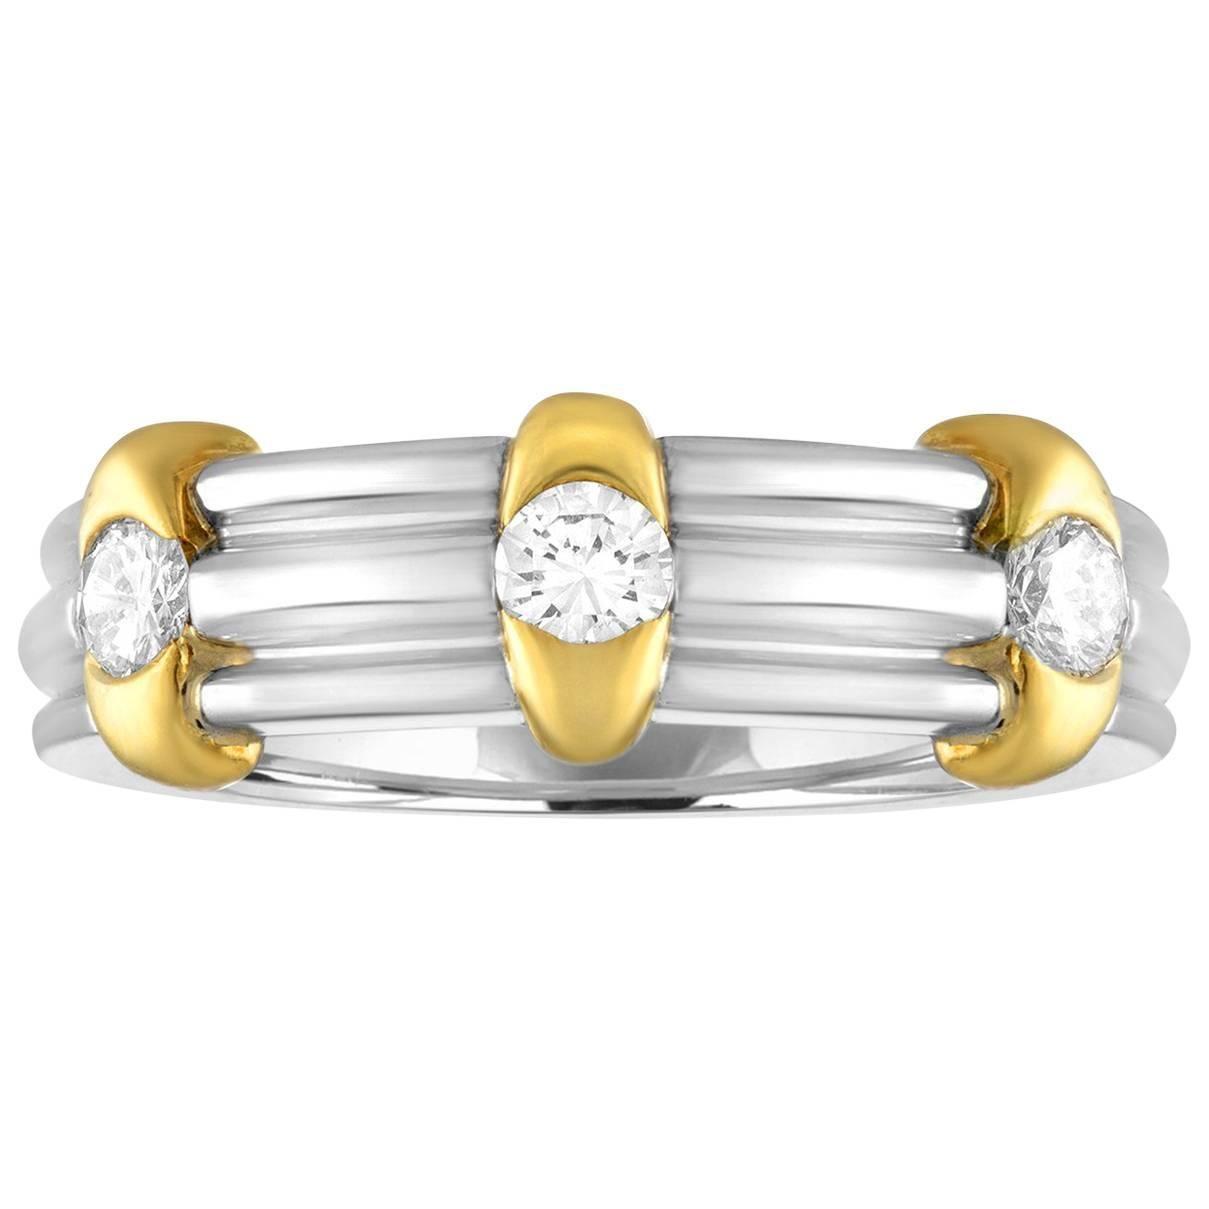 0.60 Carats Diamond Men's Platinum and Gold Wedding Band Ring